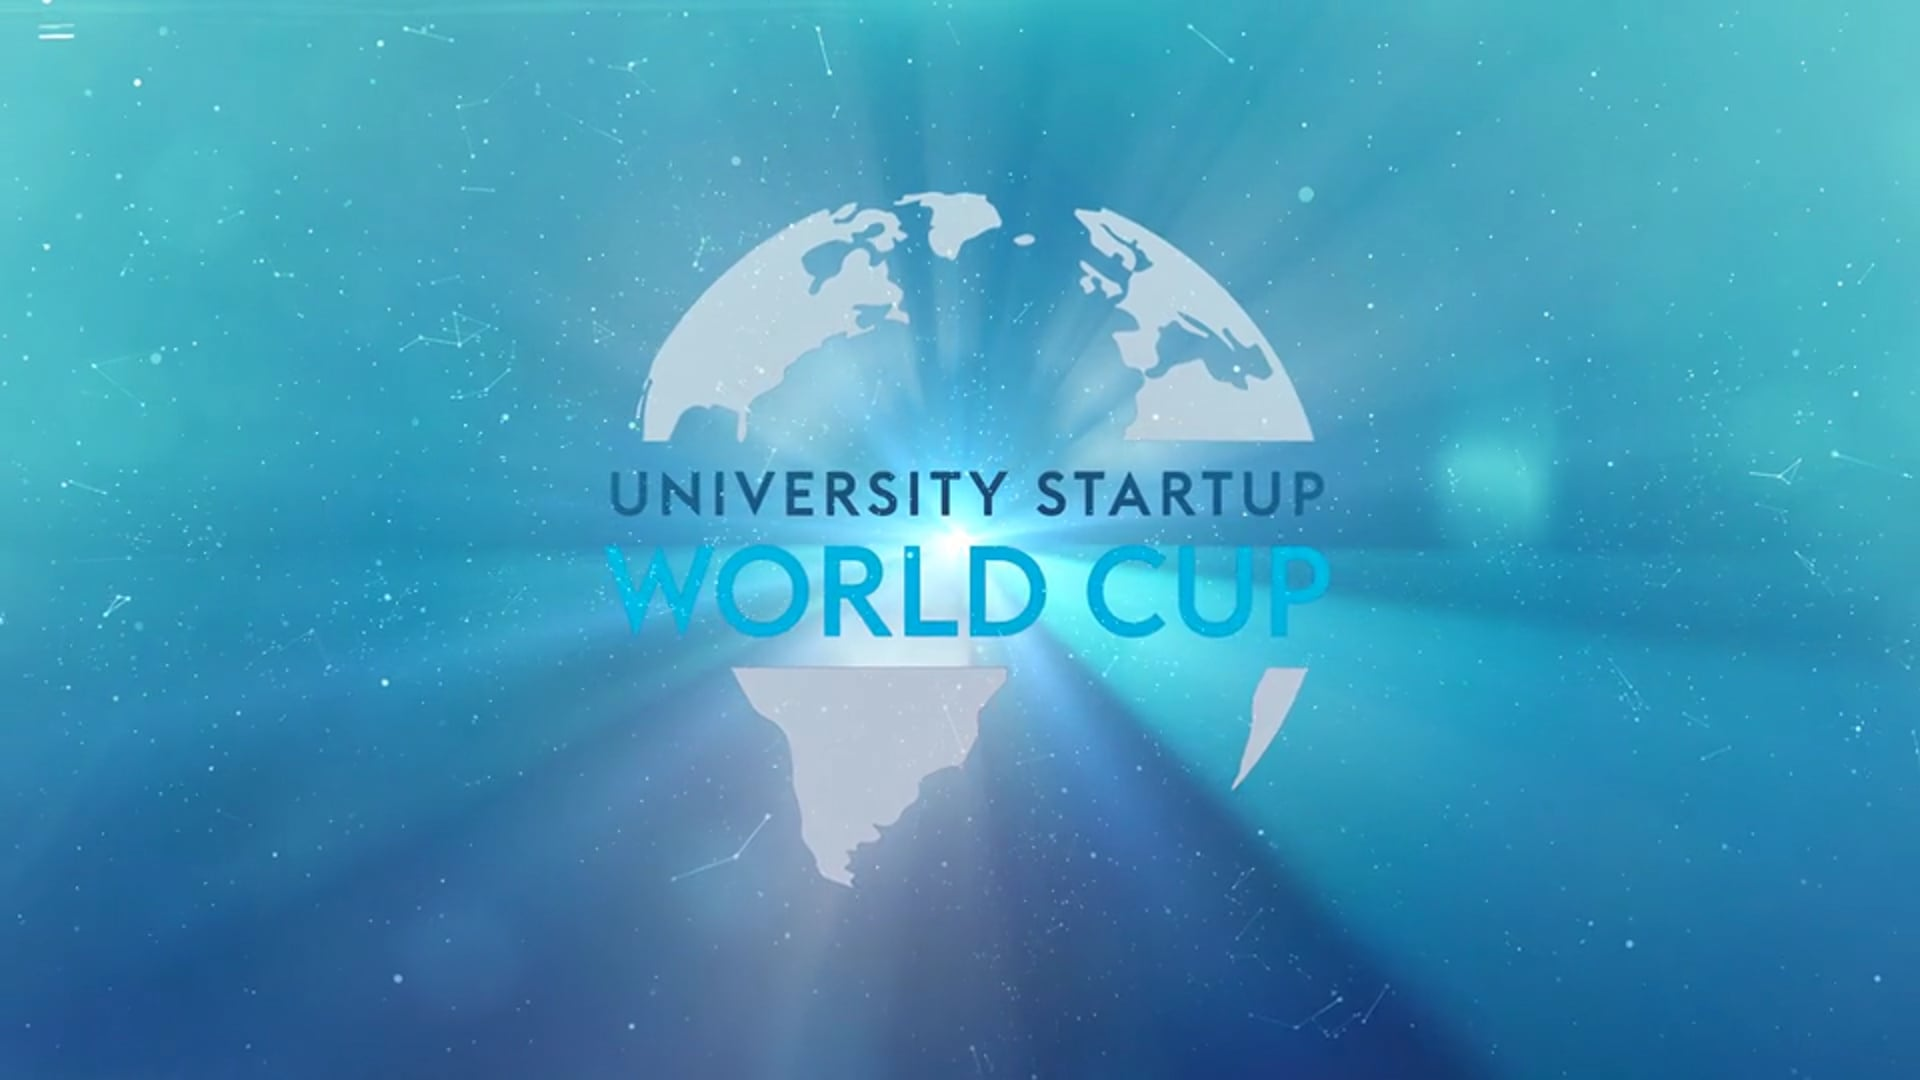 University Startup World Cup 2017 - Copenhagen